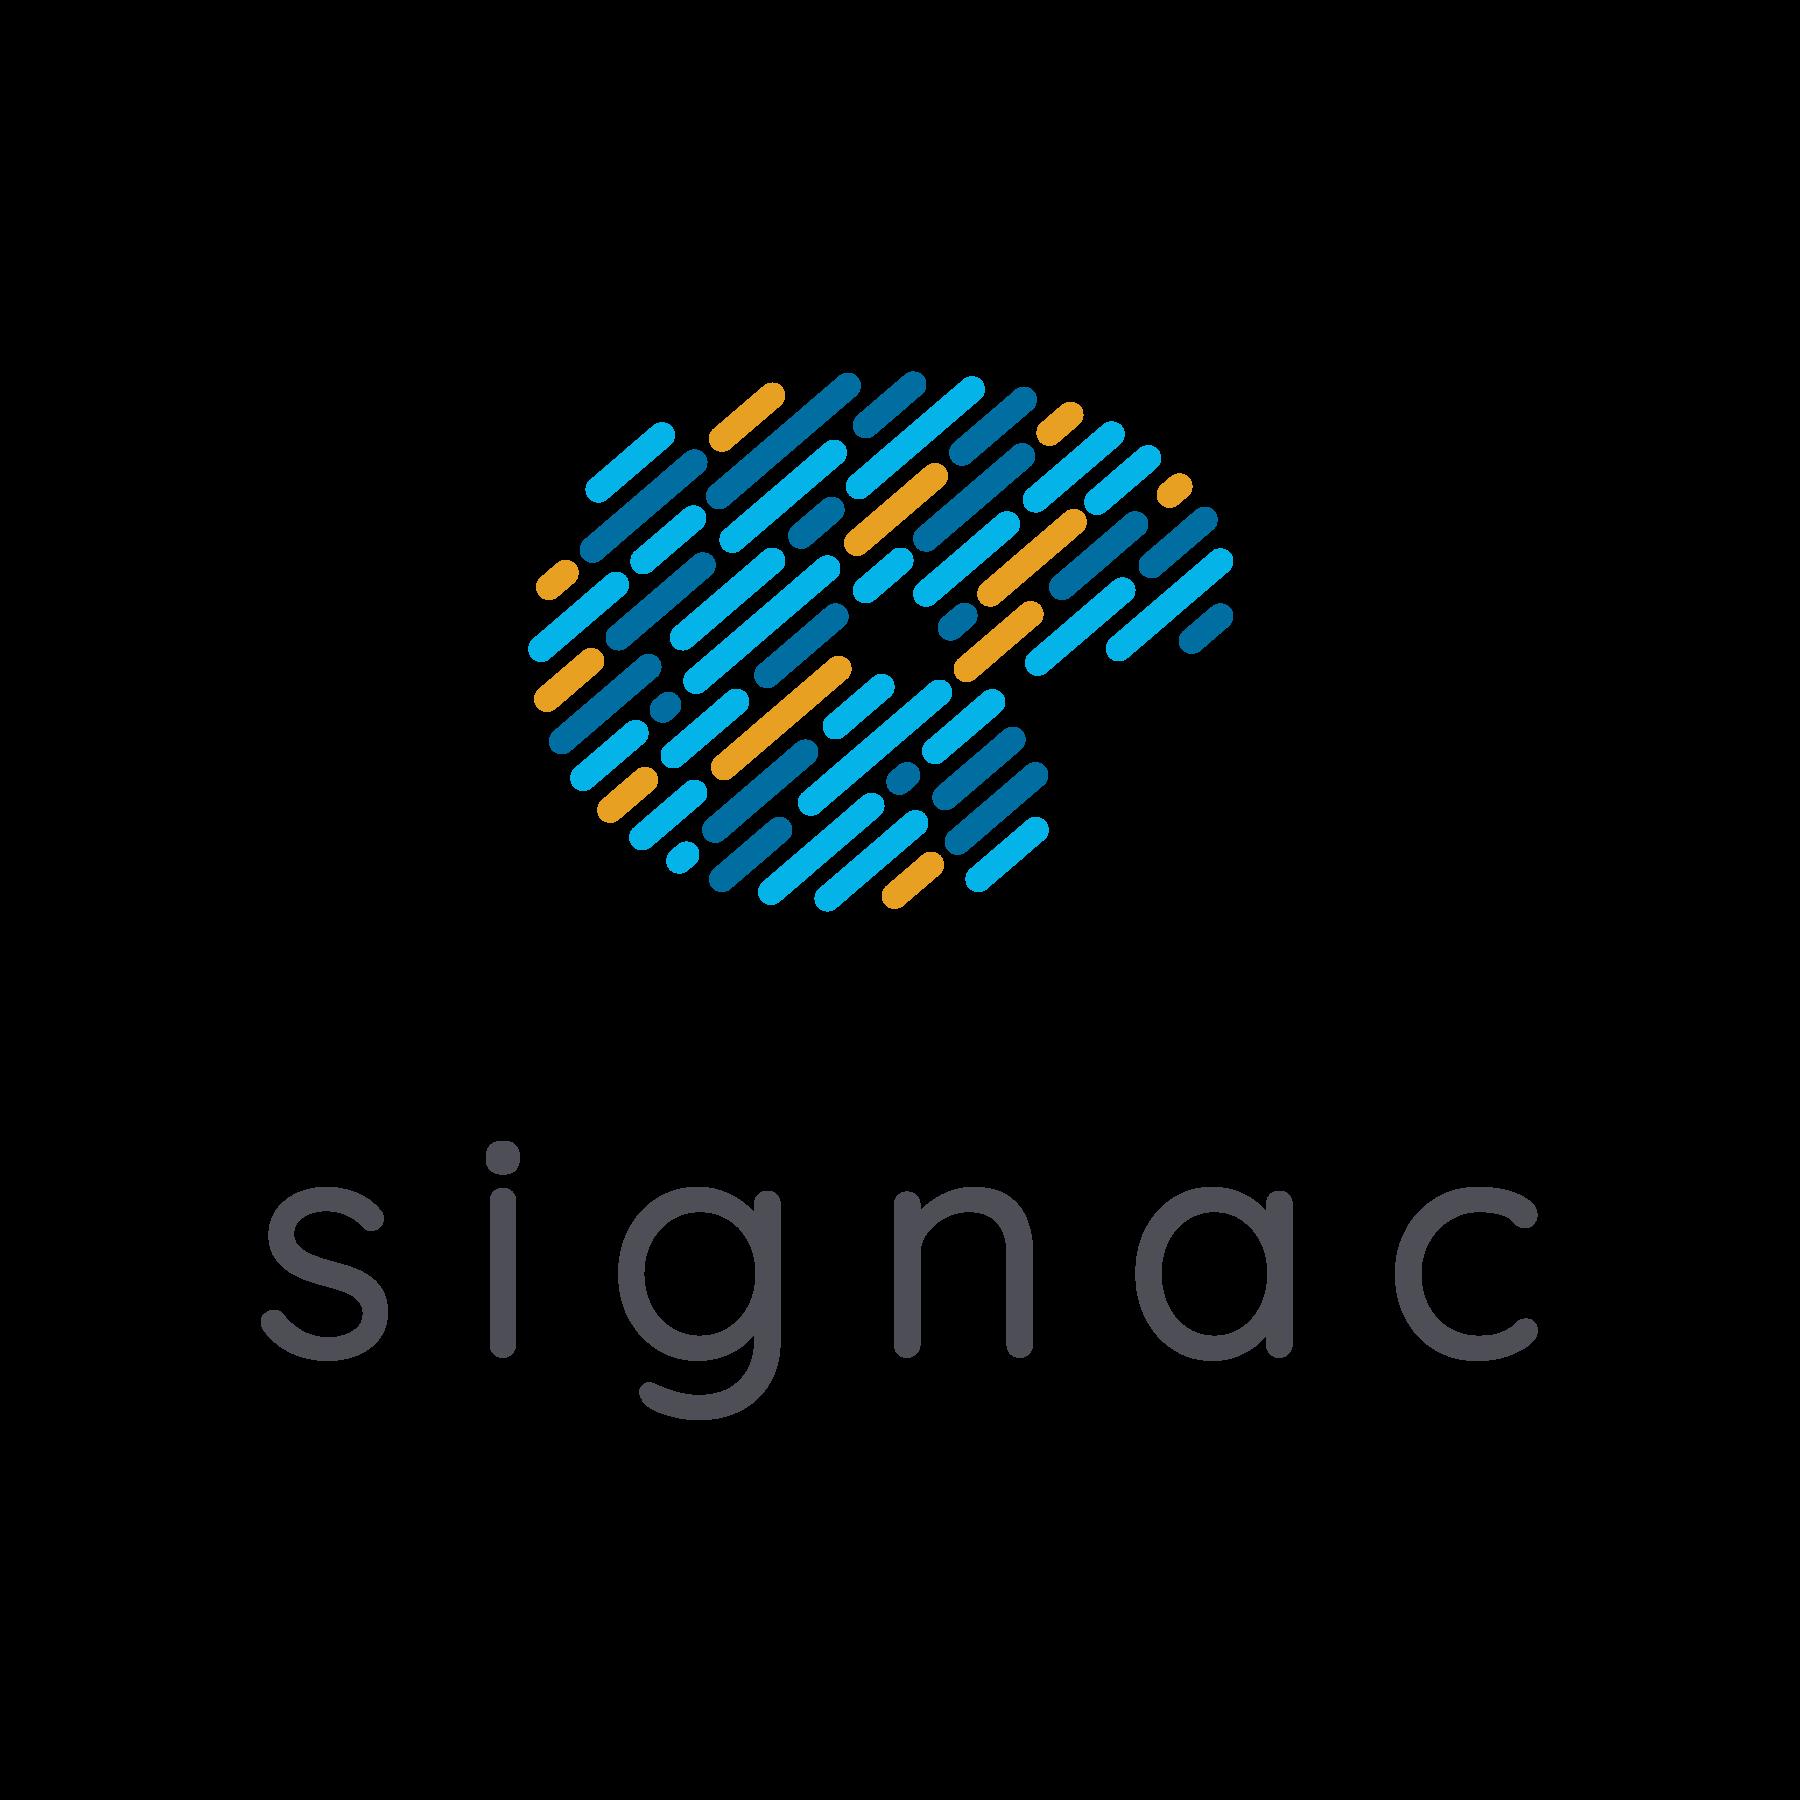 signac palette logo